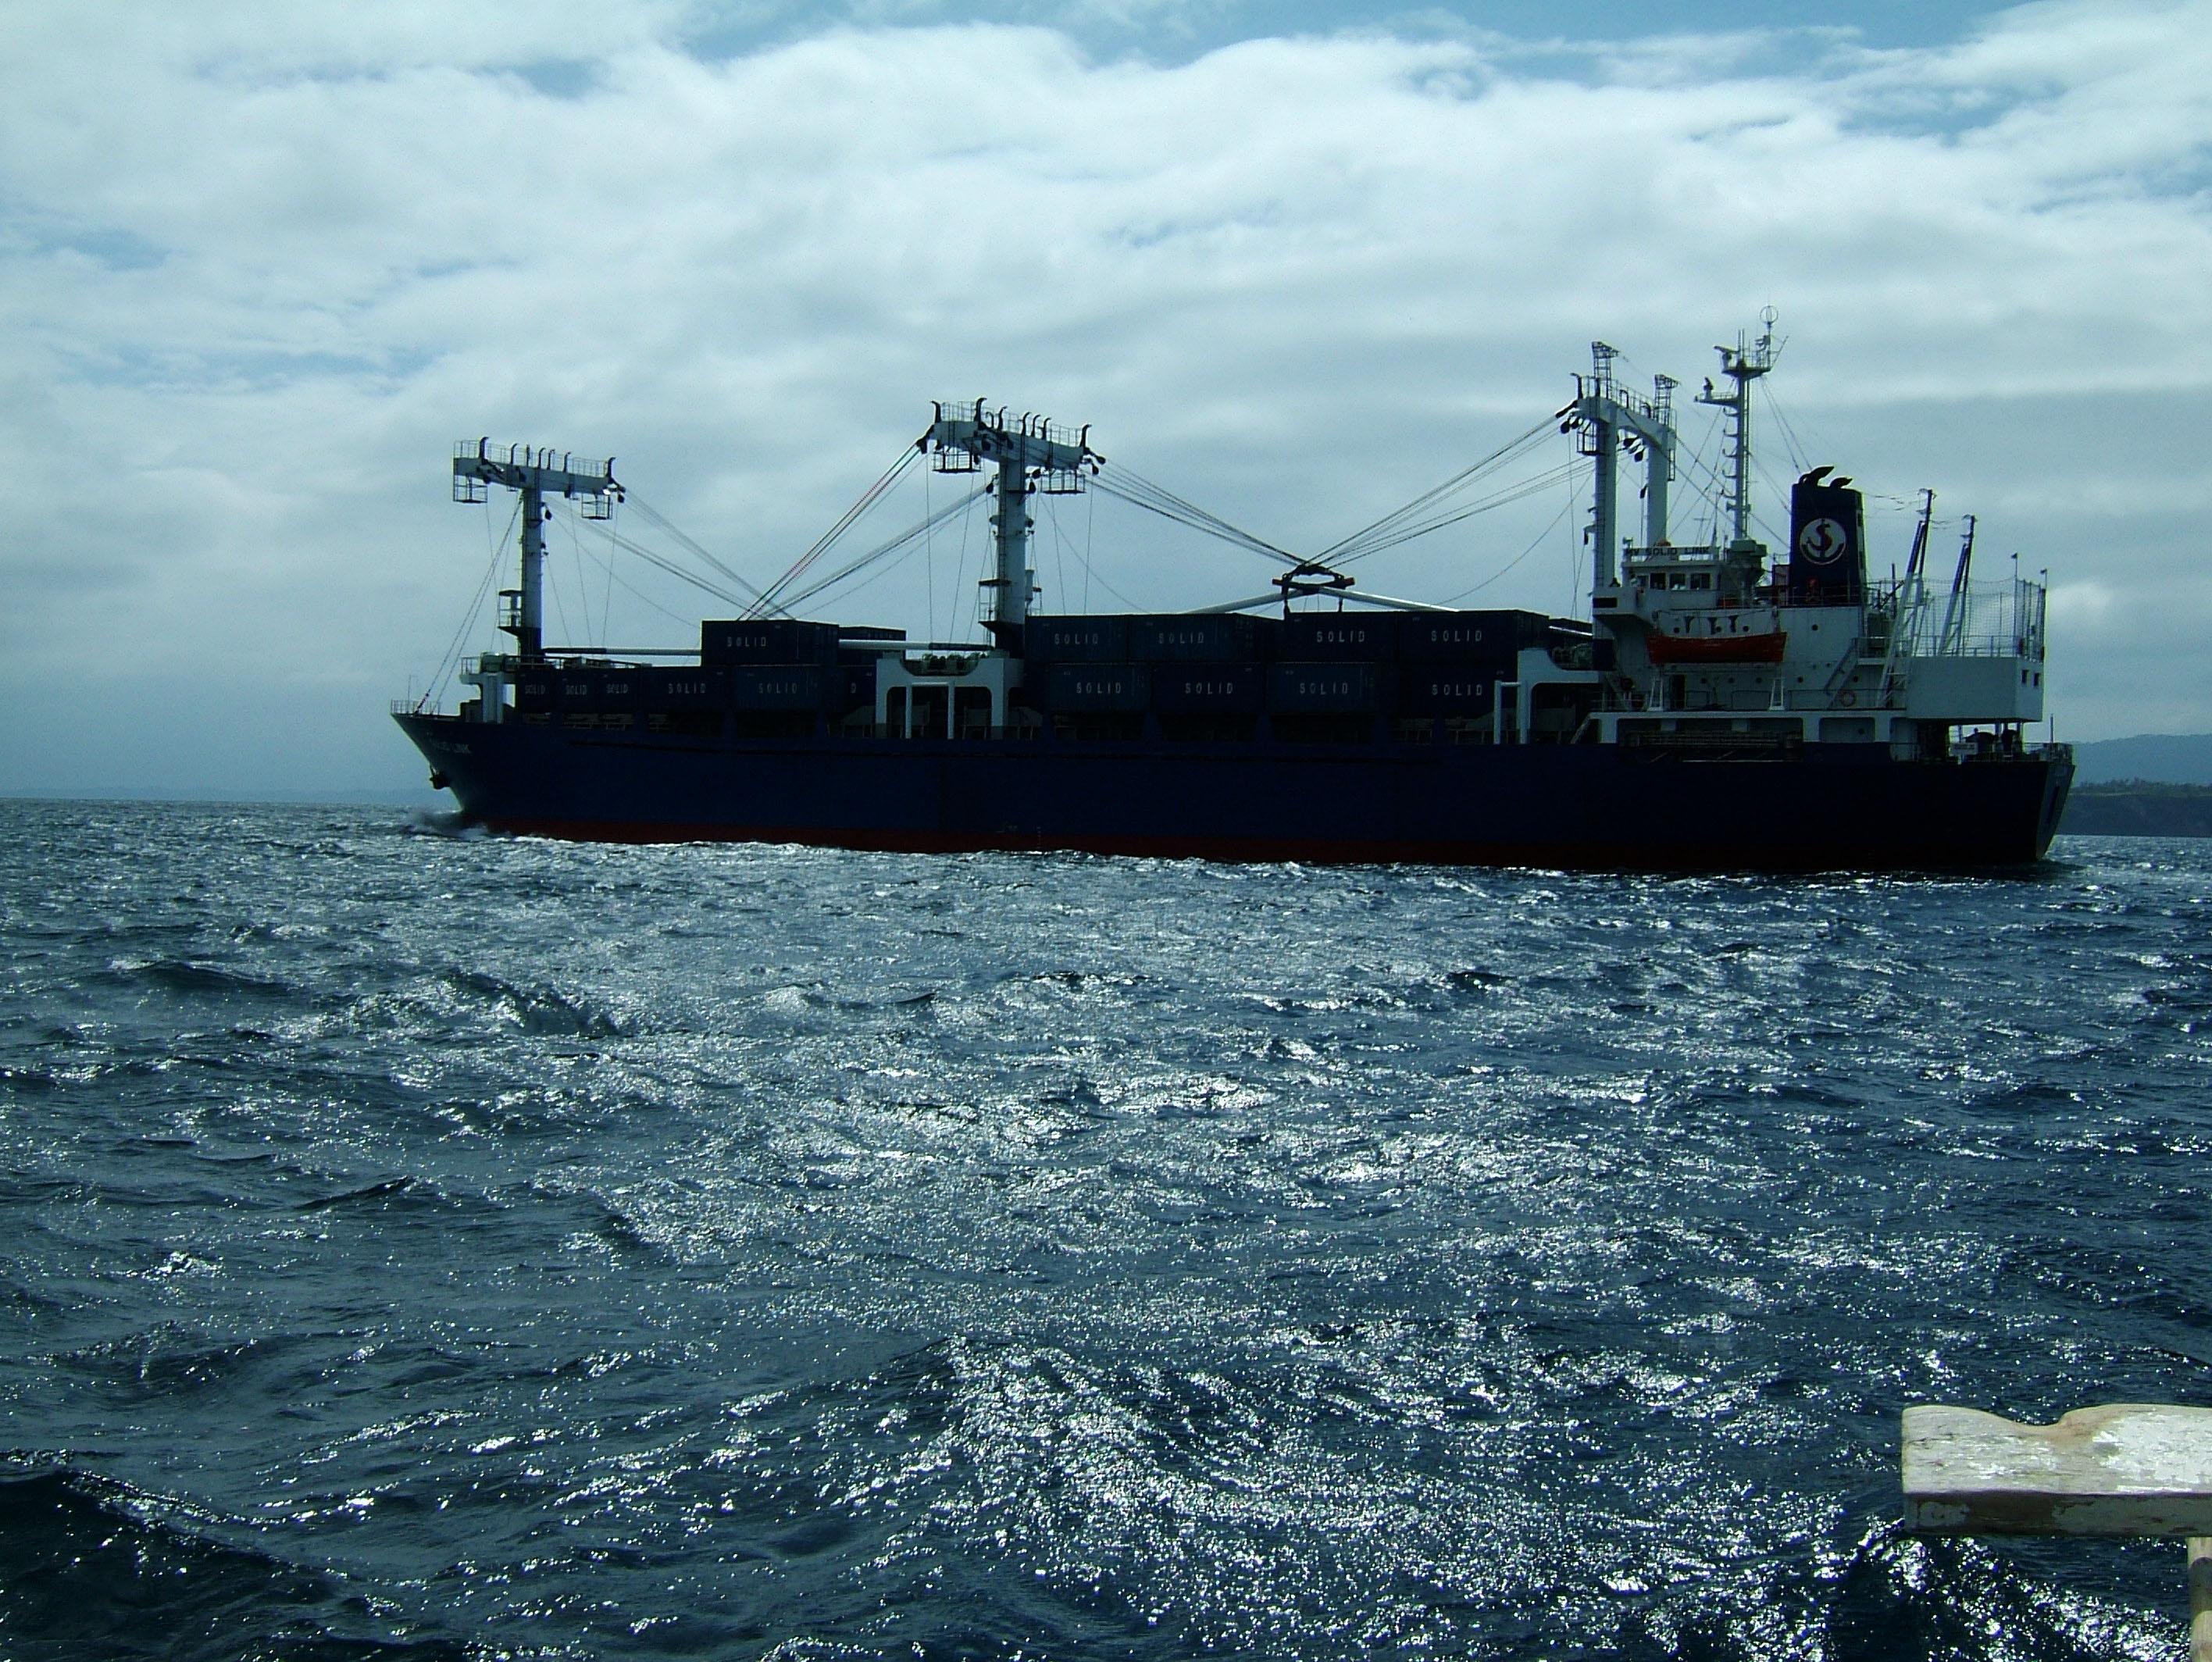 MS Solid Link via Verde Island passage 03